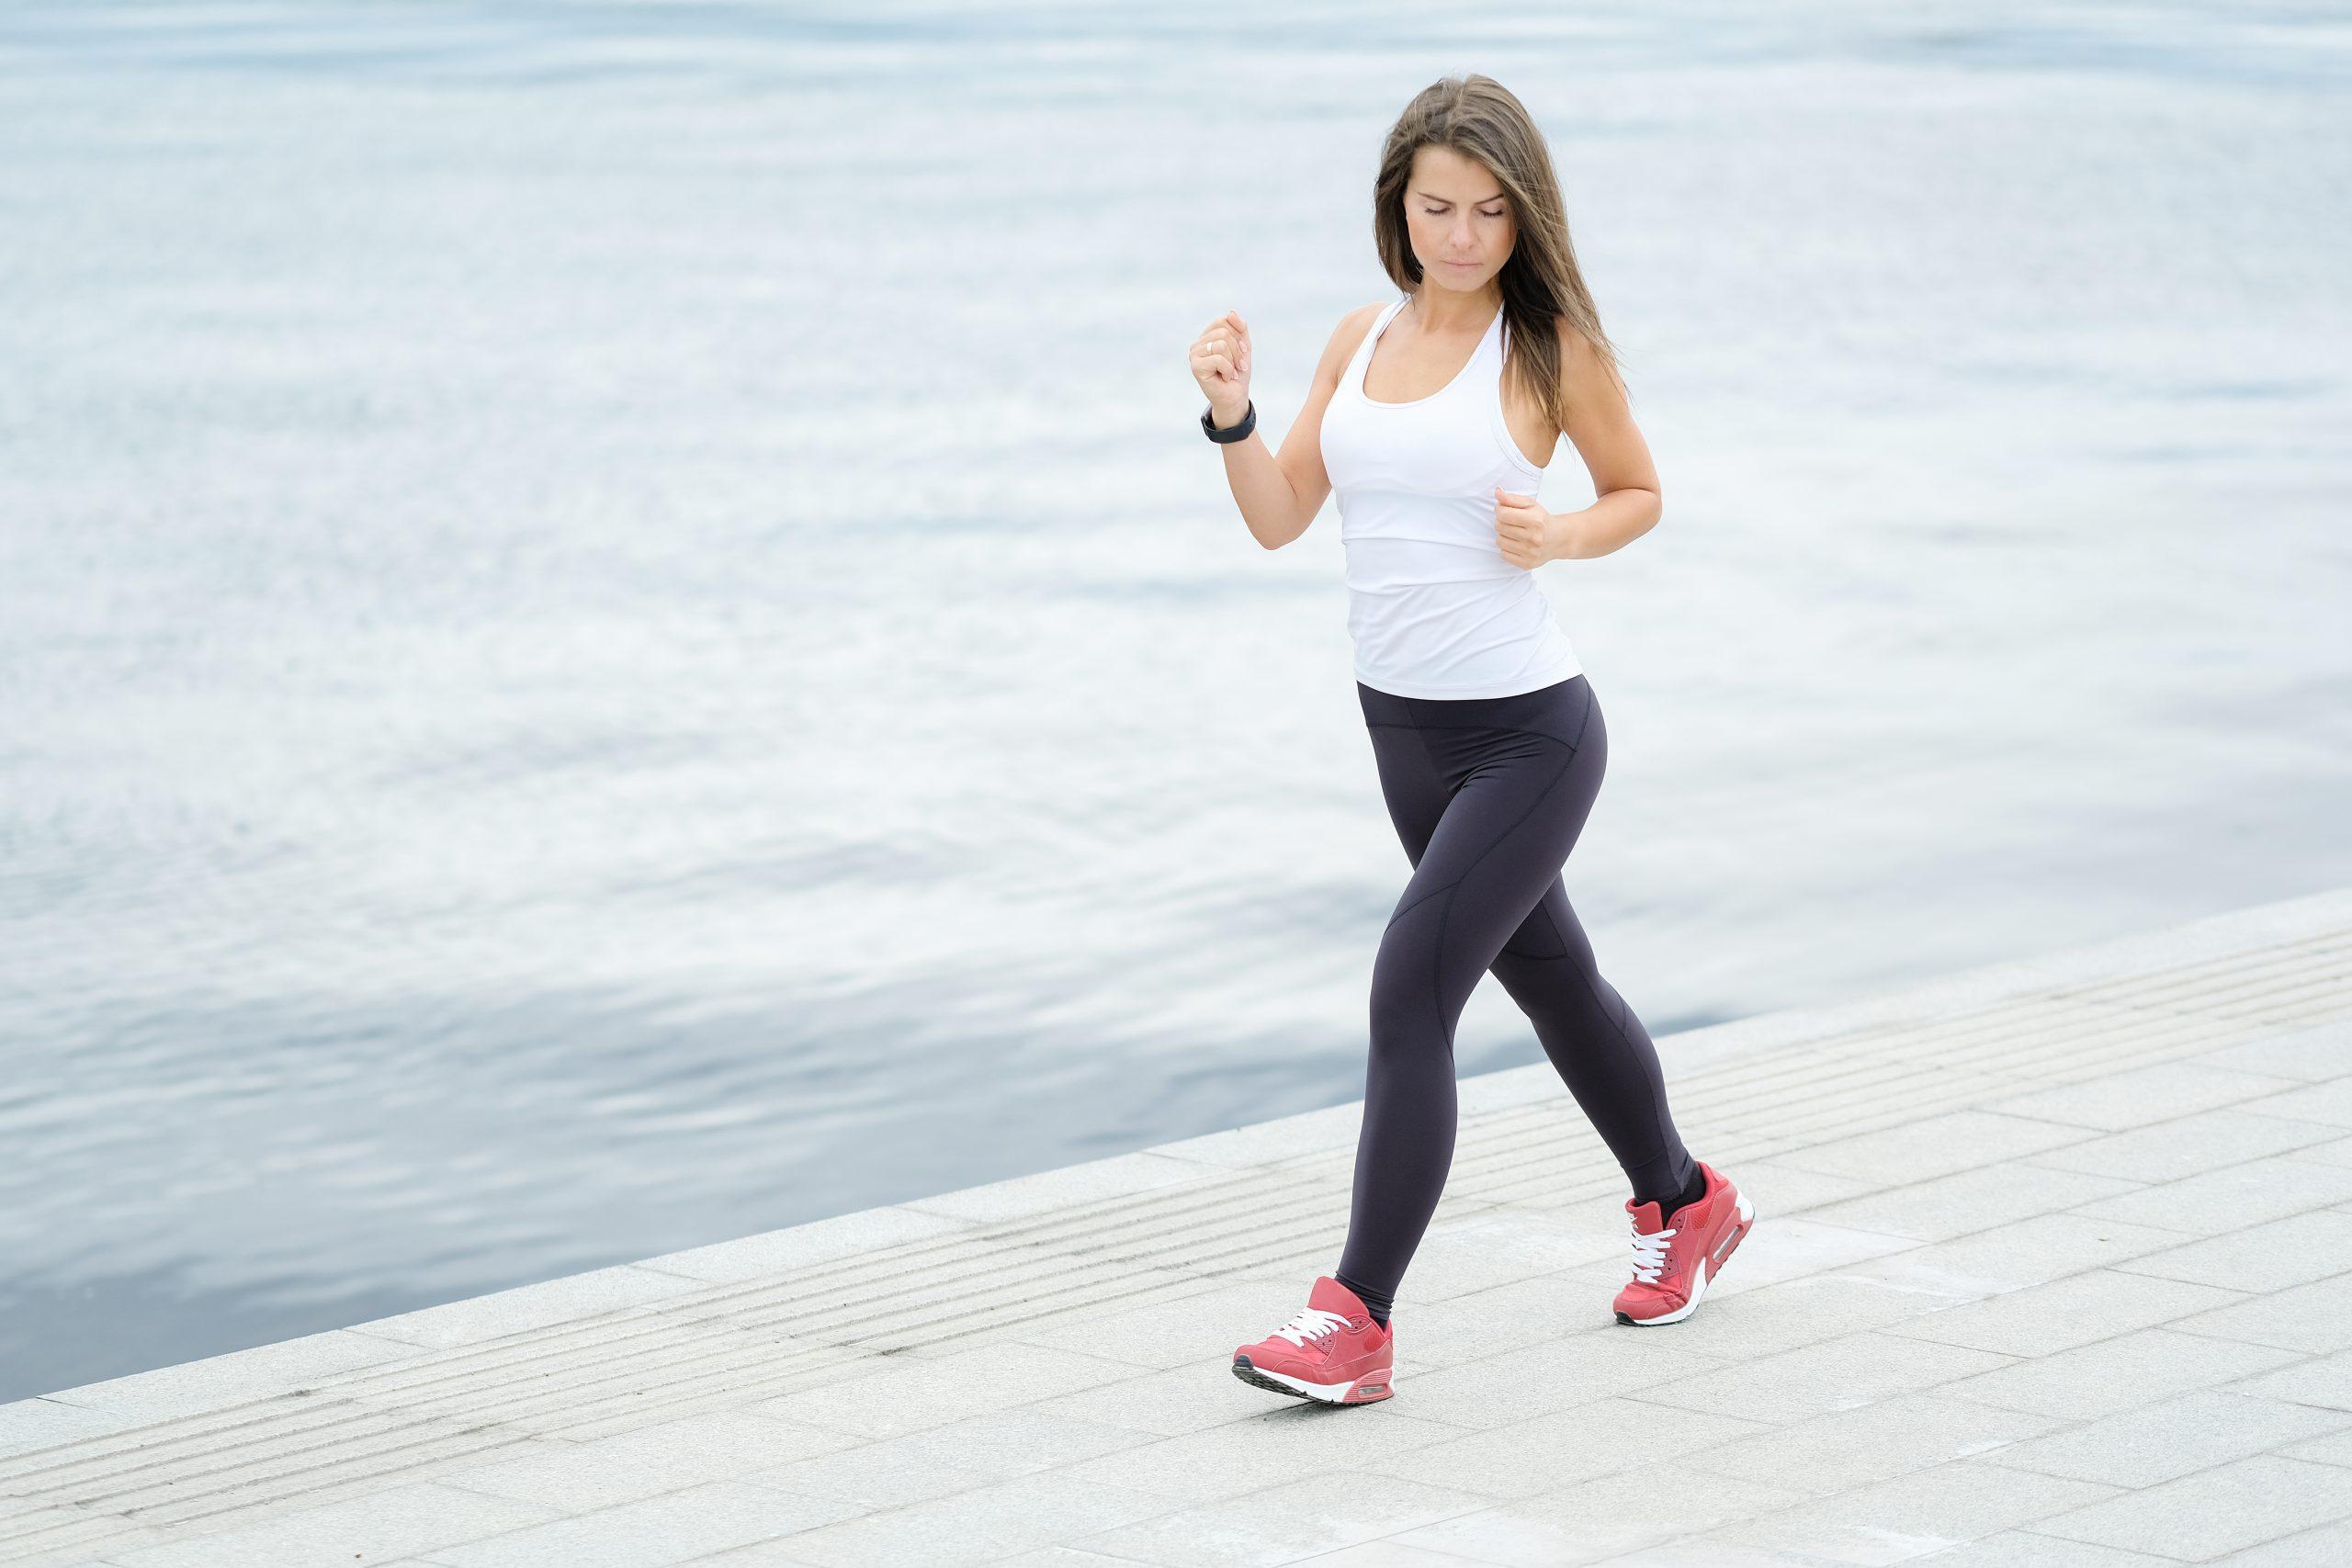 Woman doing light exercise to prevent kidney disease progression